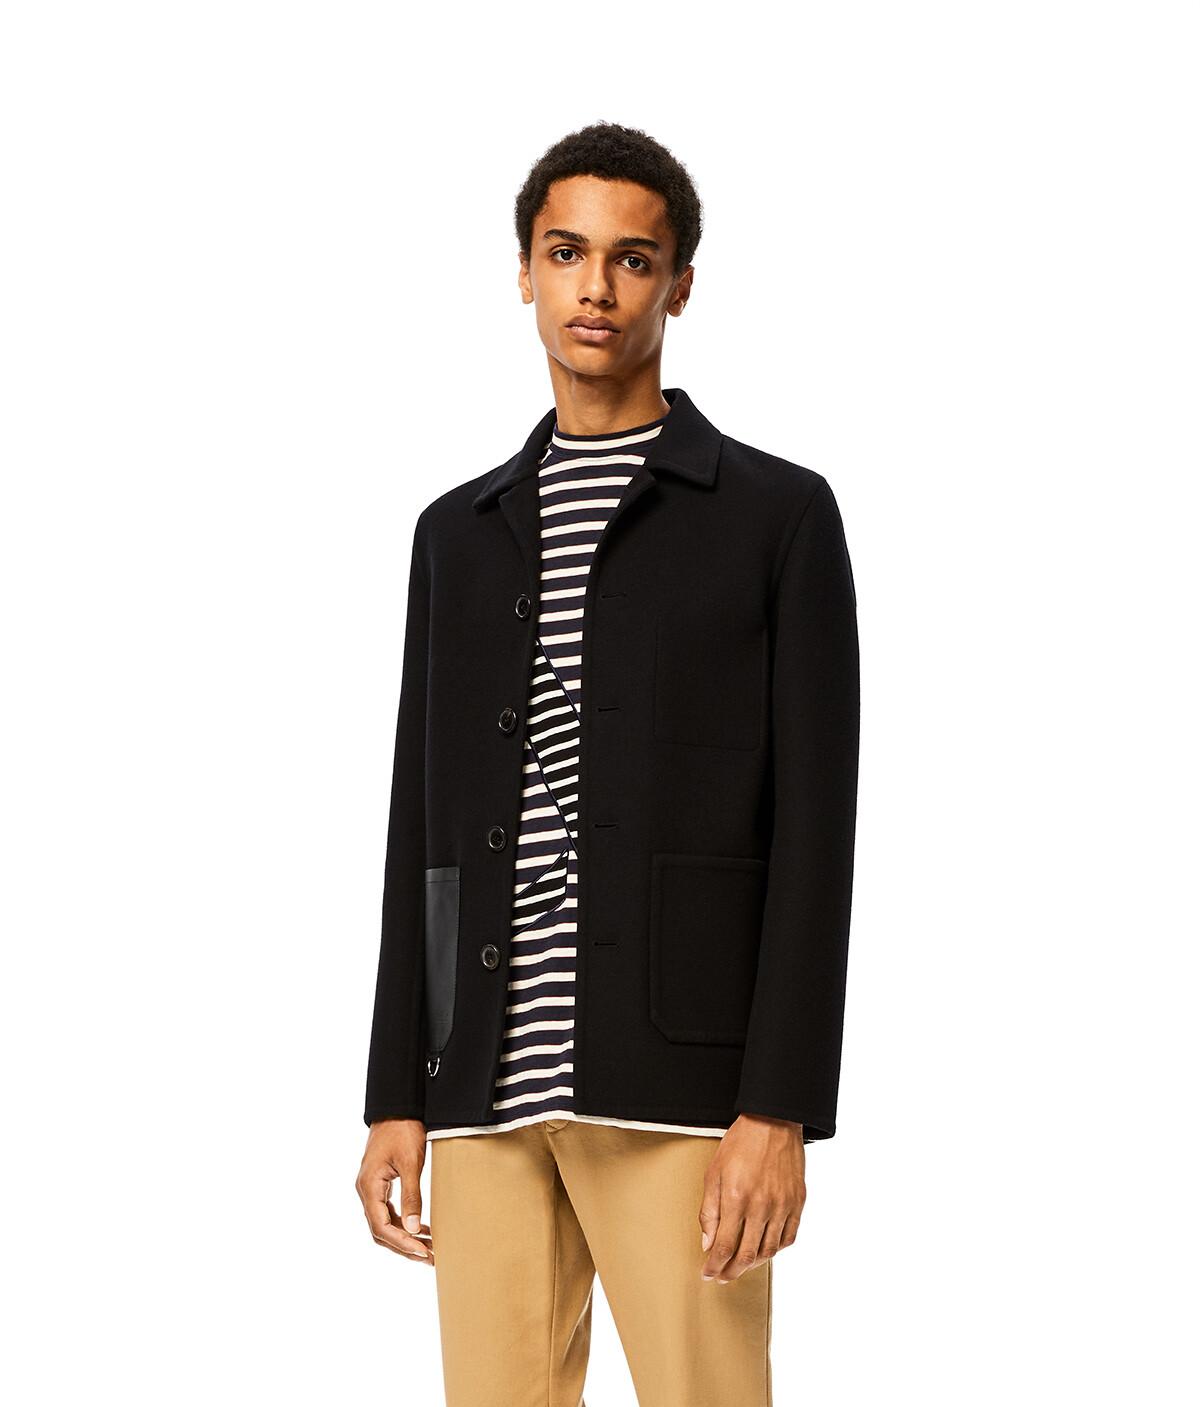 LOEWE Workwear Jacket Black front